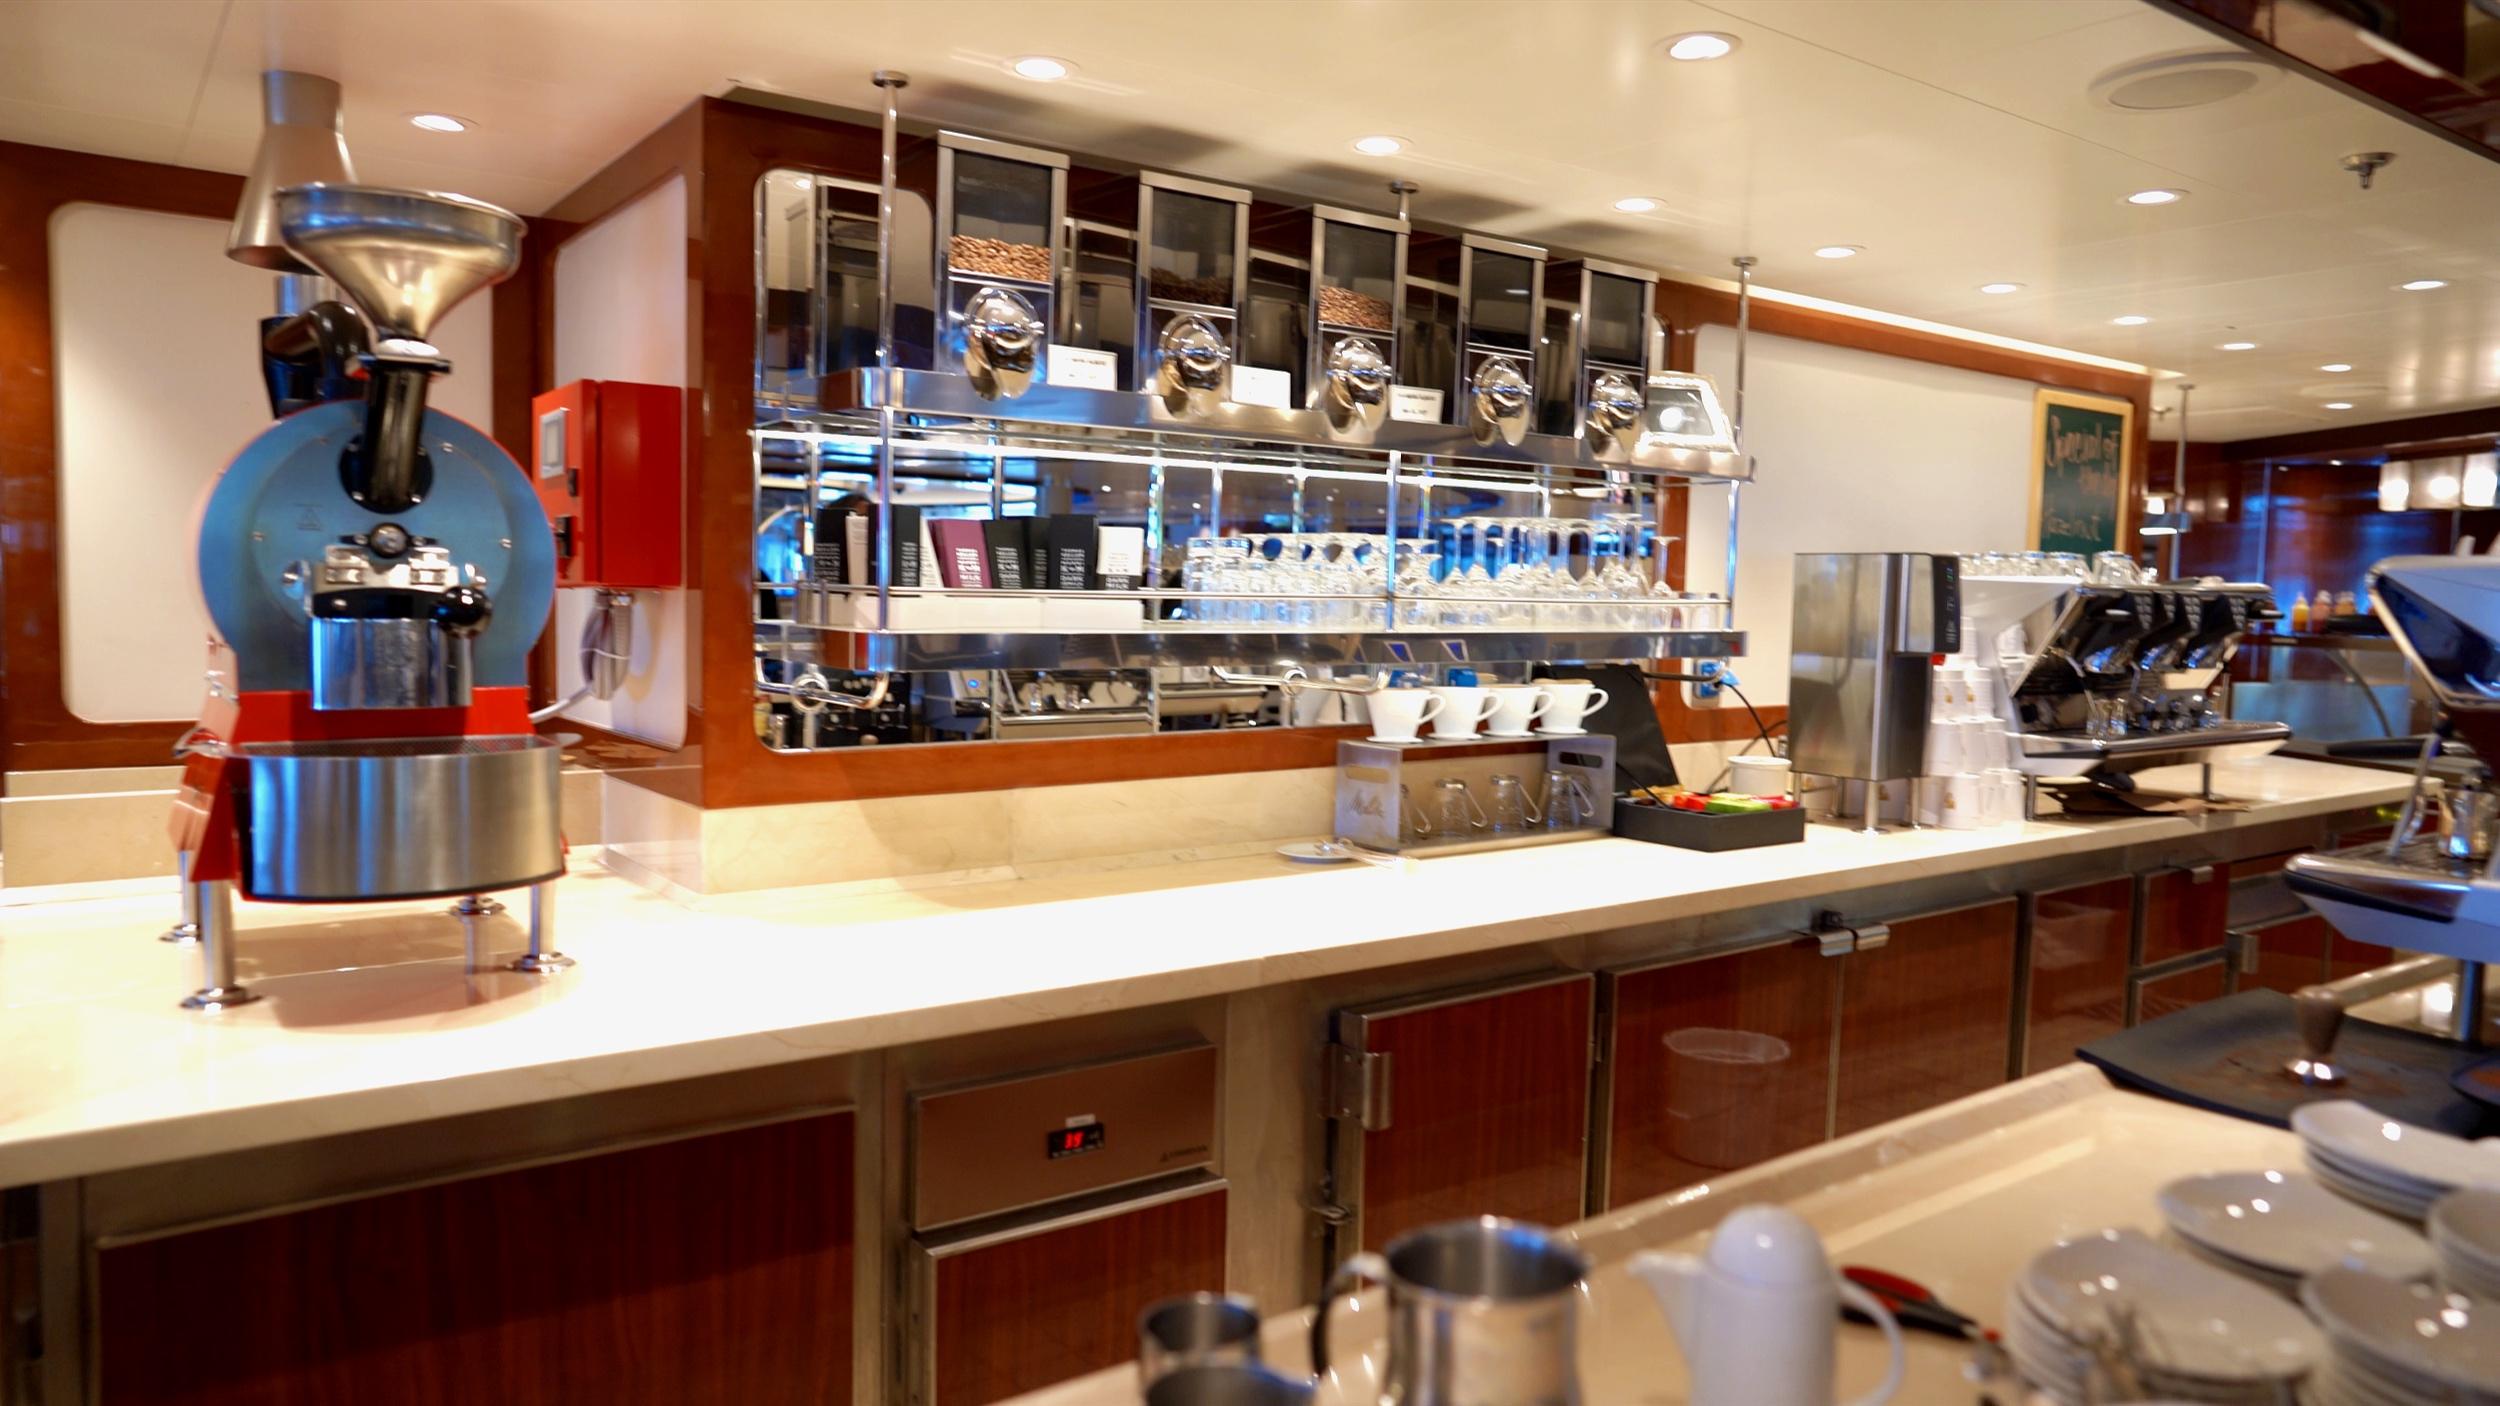 Seabourn Square coffee bar.